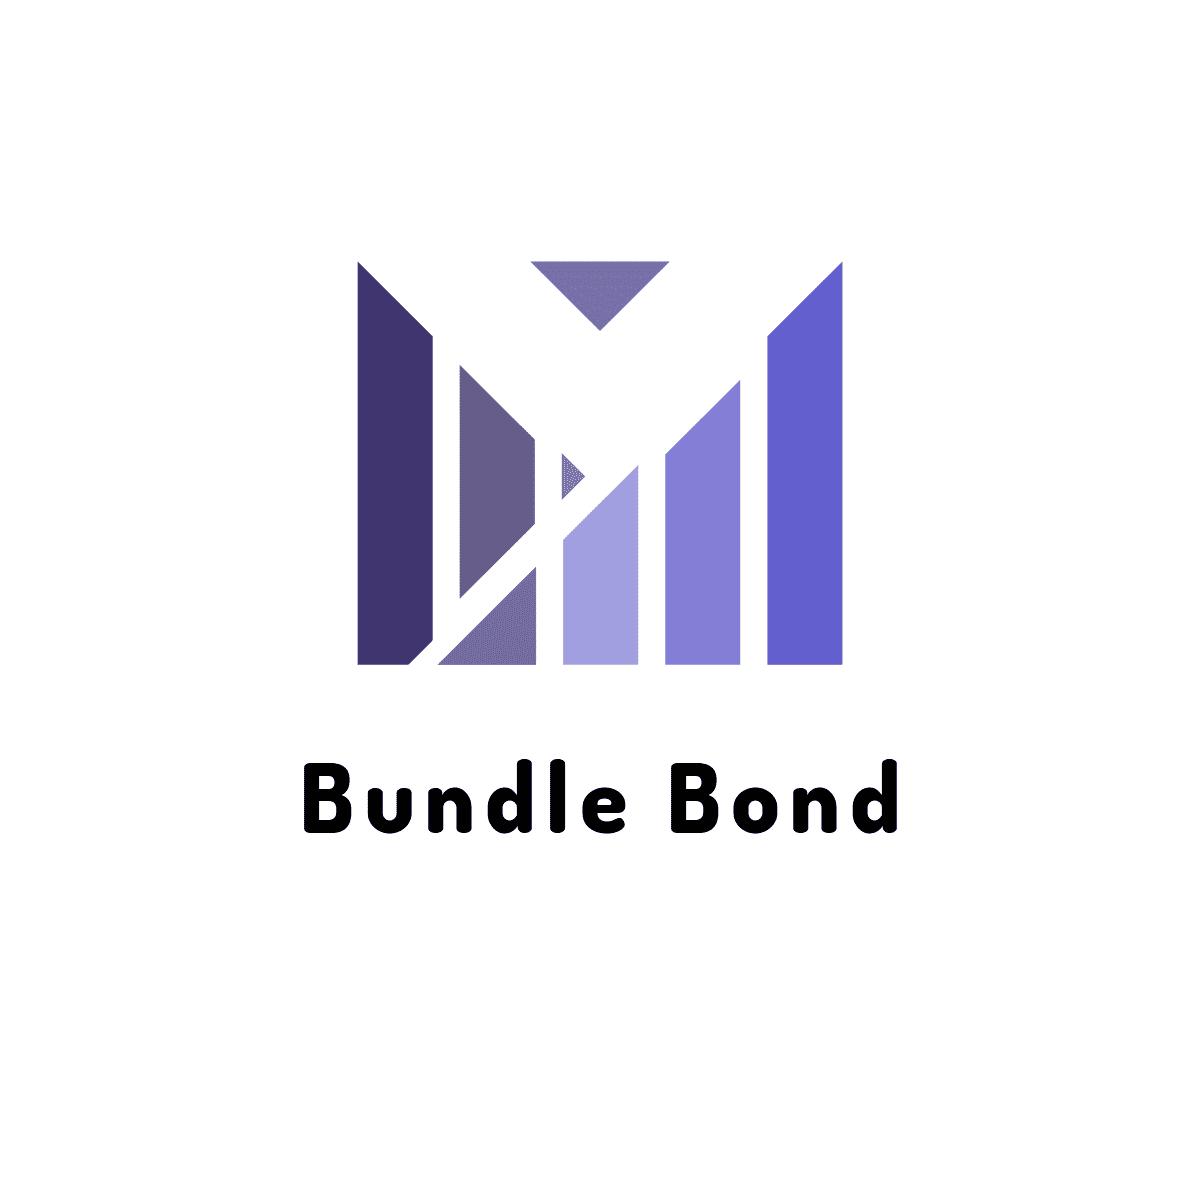 Bundle.bond